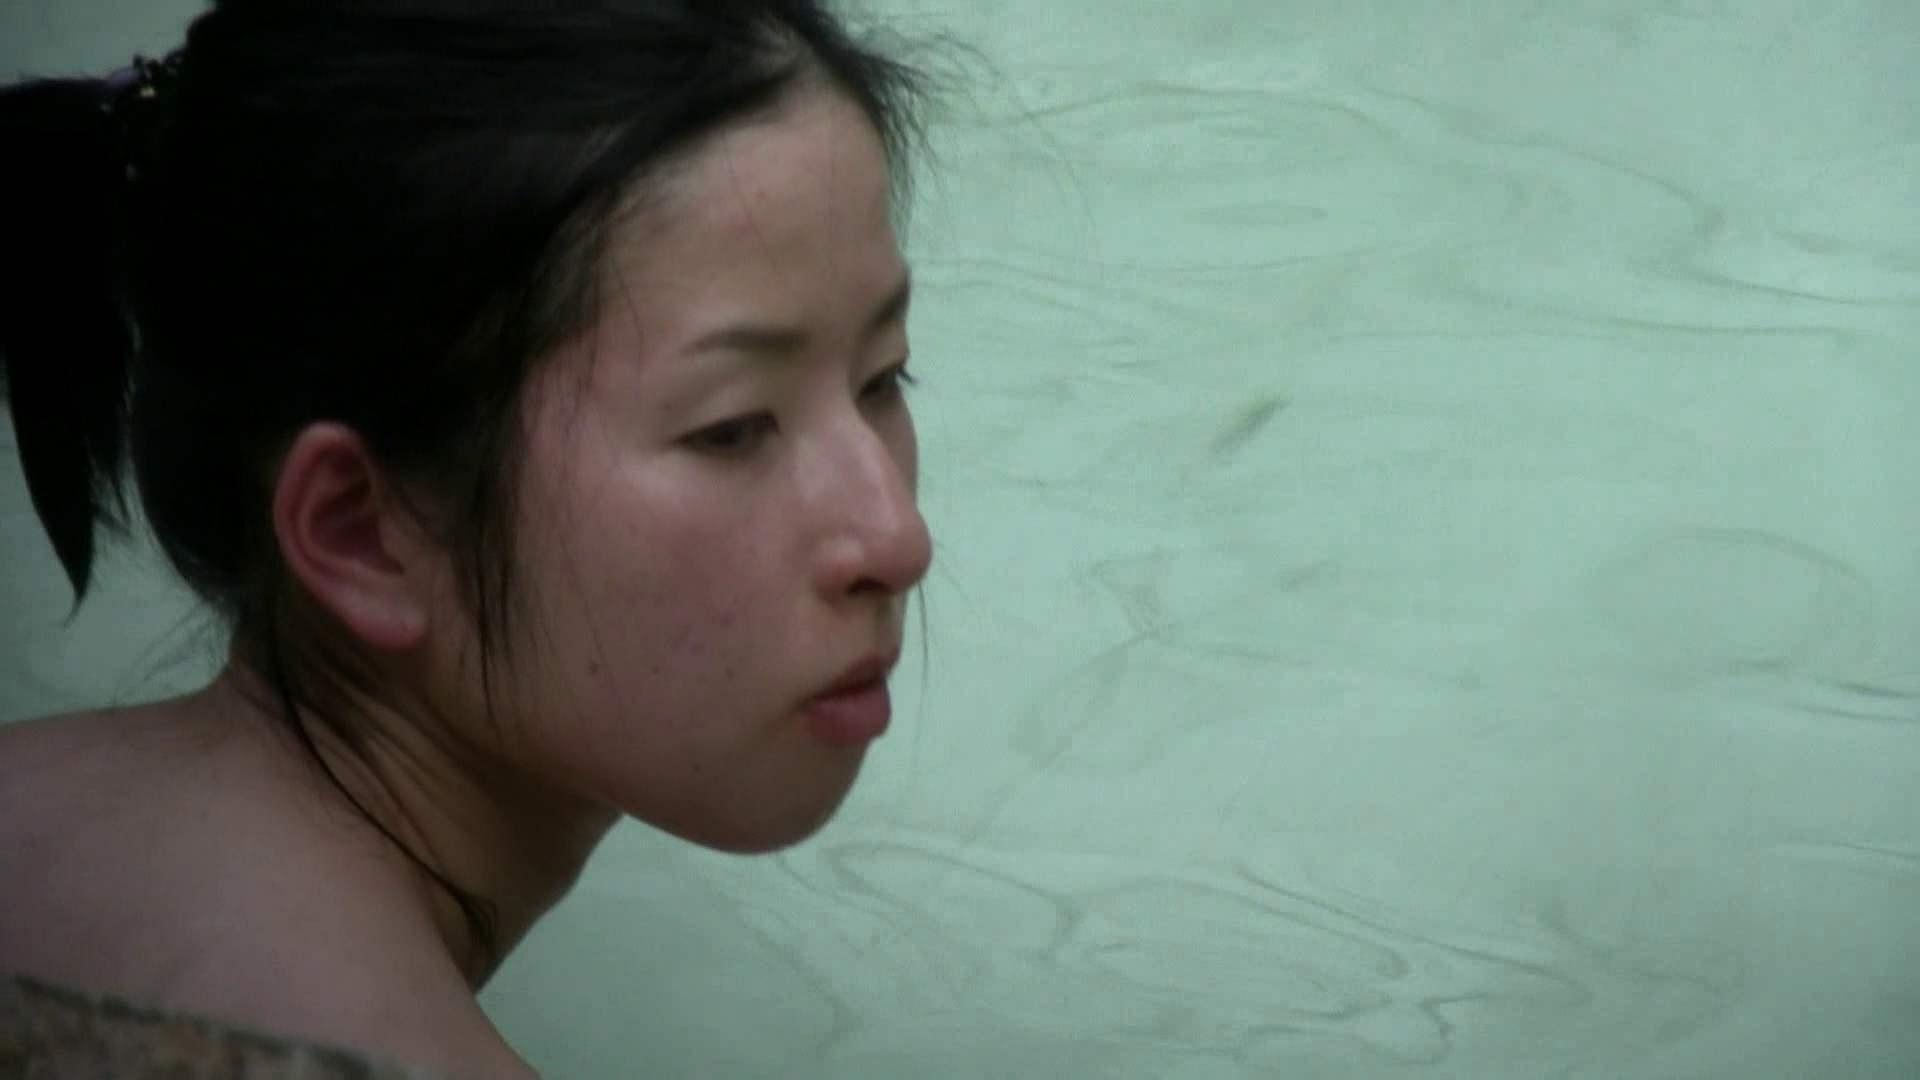 Aquaな露天風呂Vol.656 OLセックス   露天  72画像 34